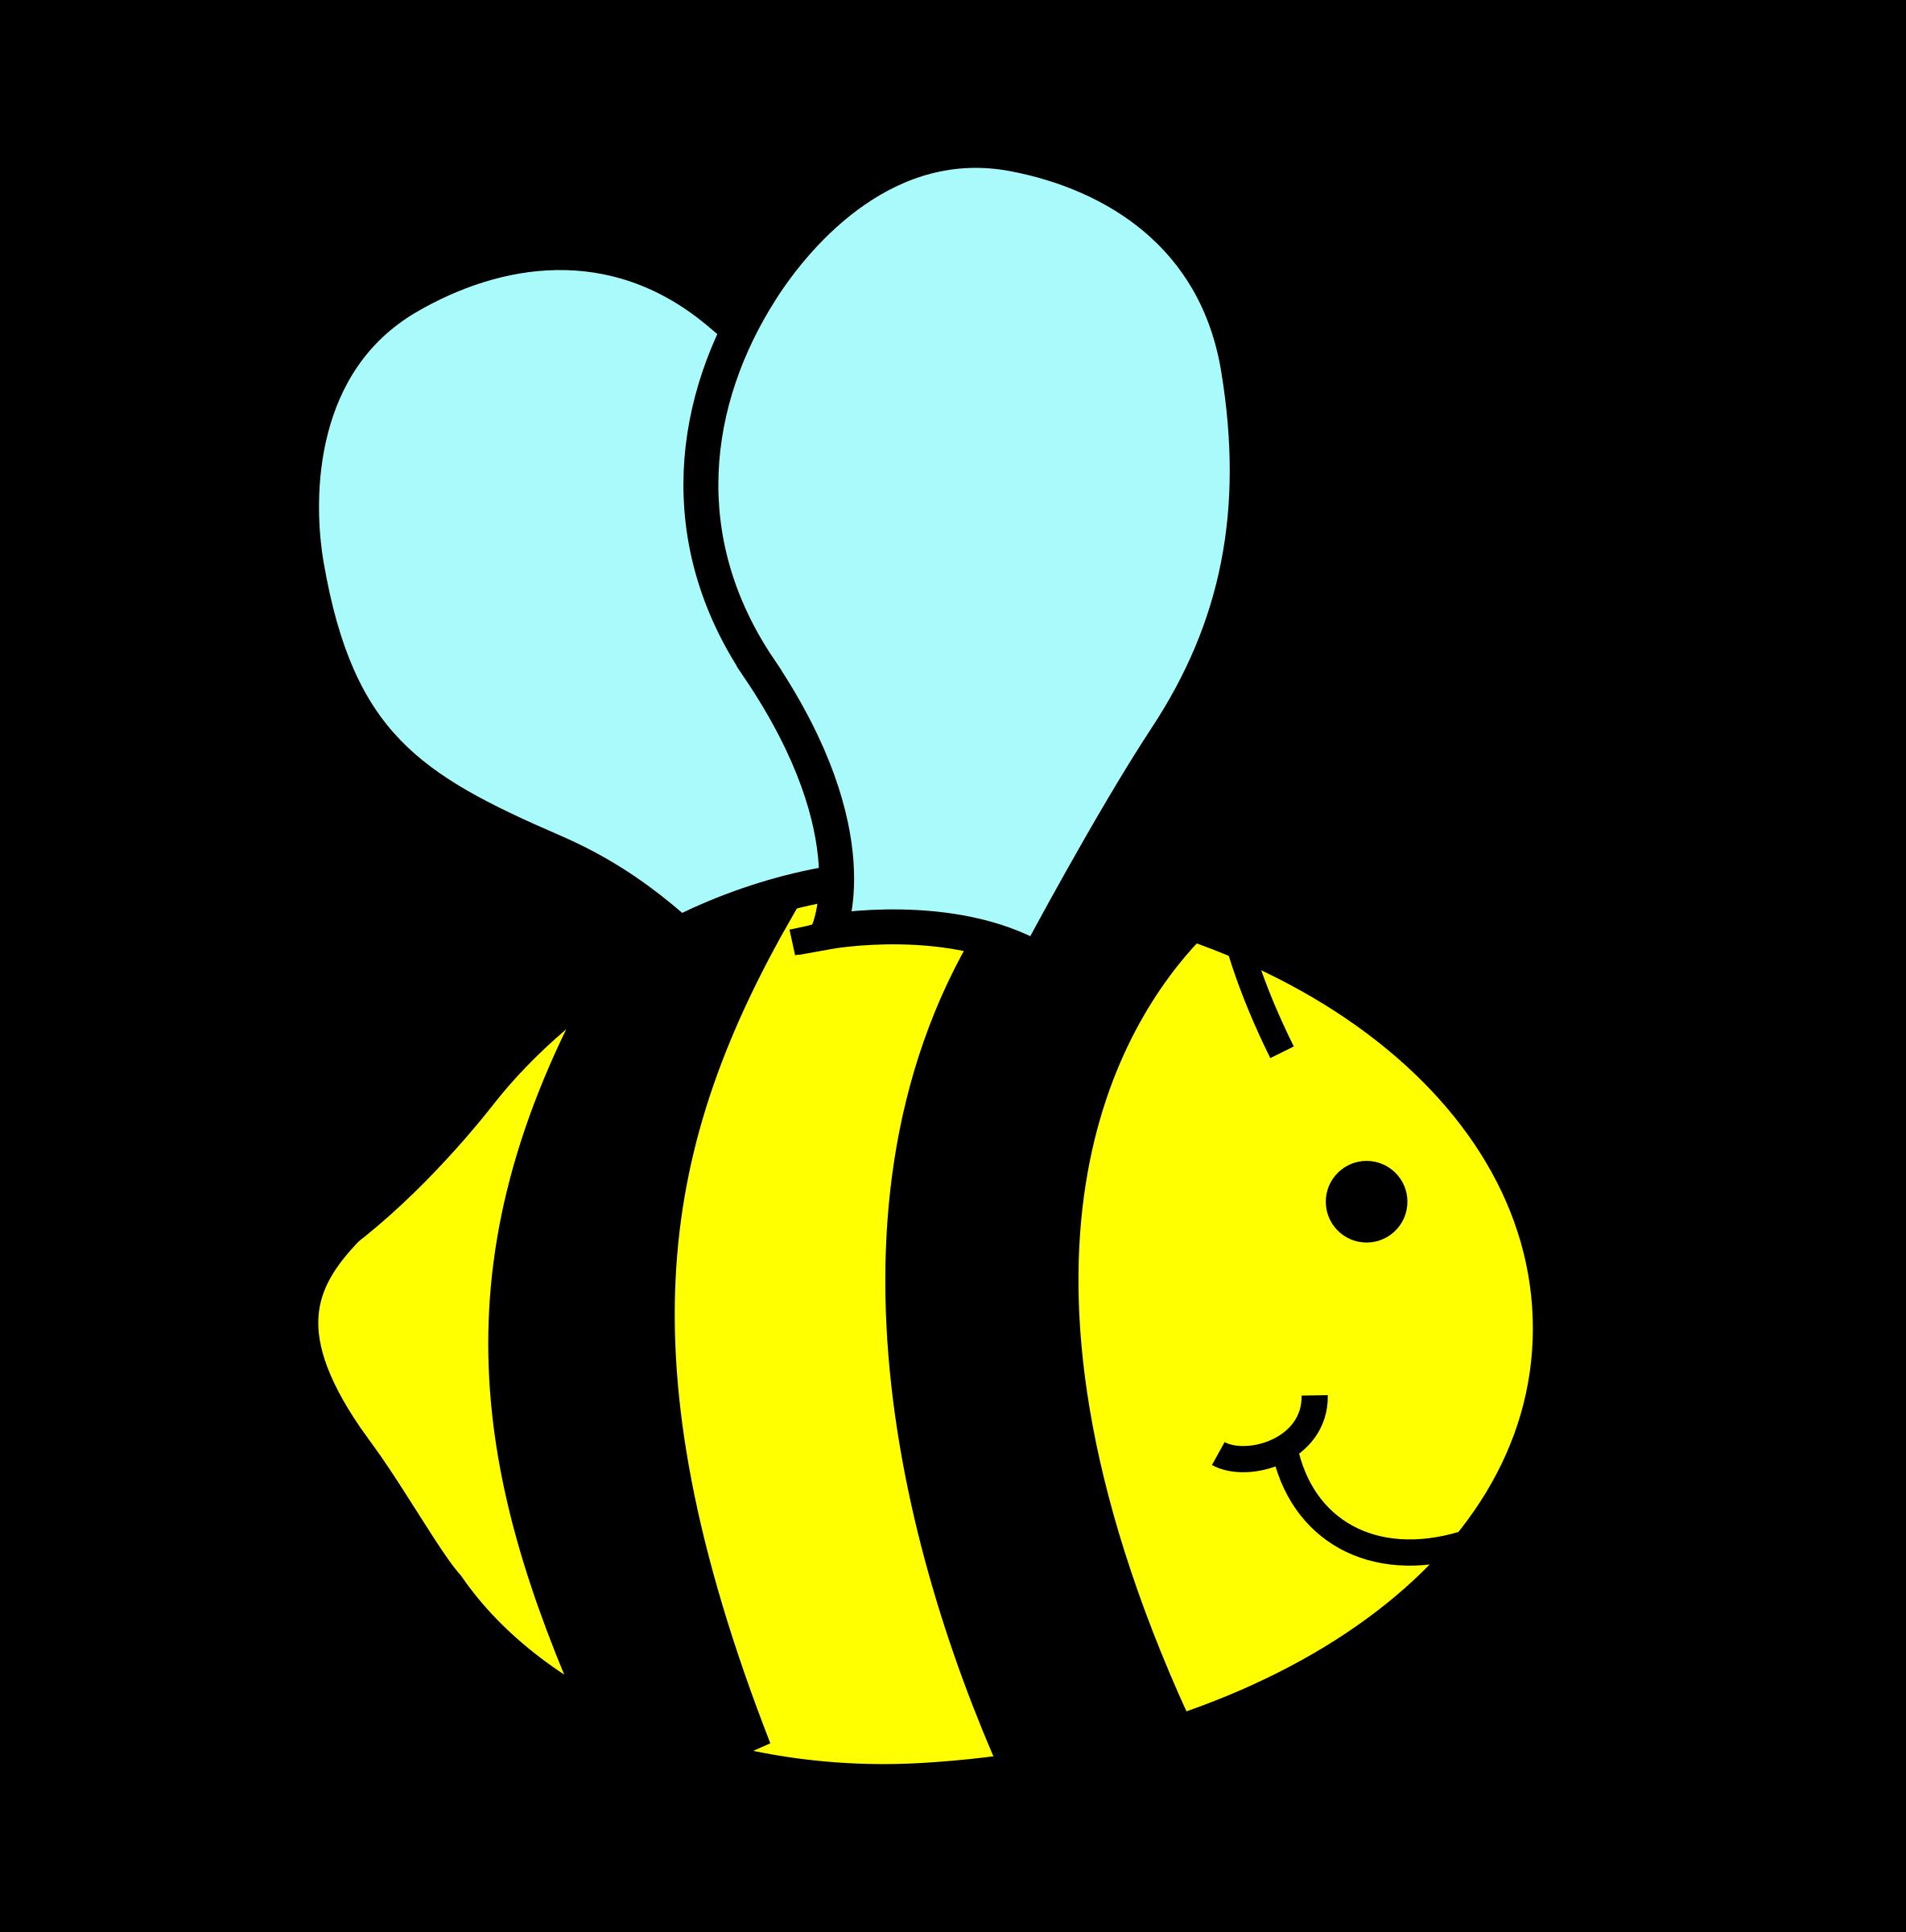 Pics Of Bumble Bees